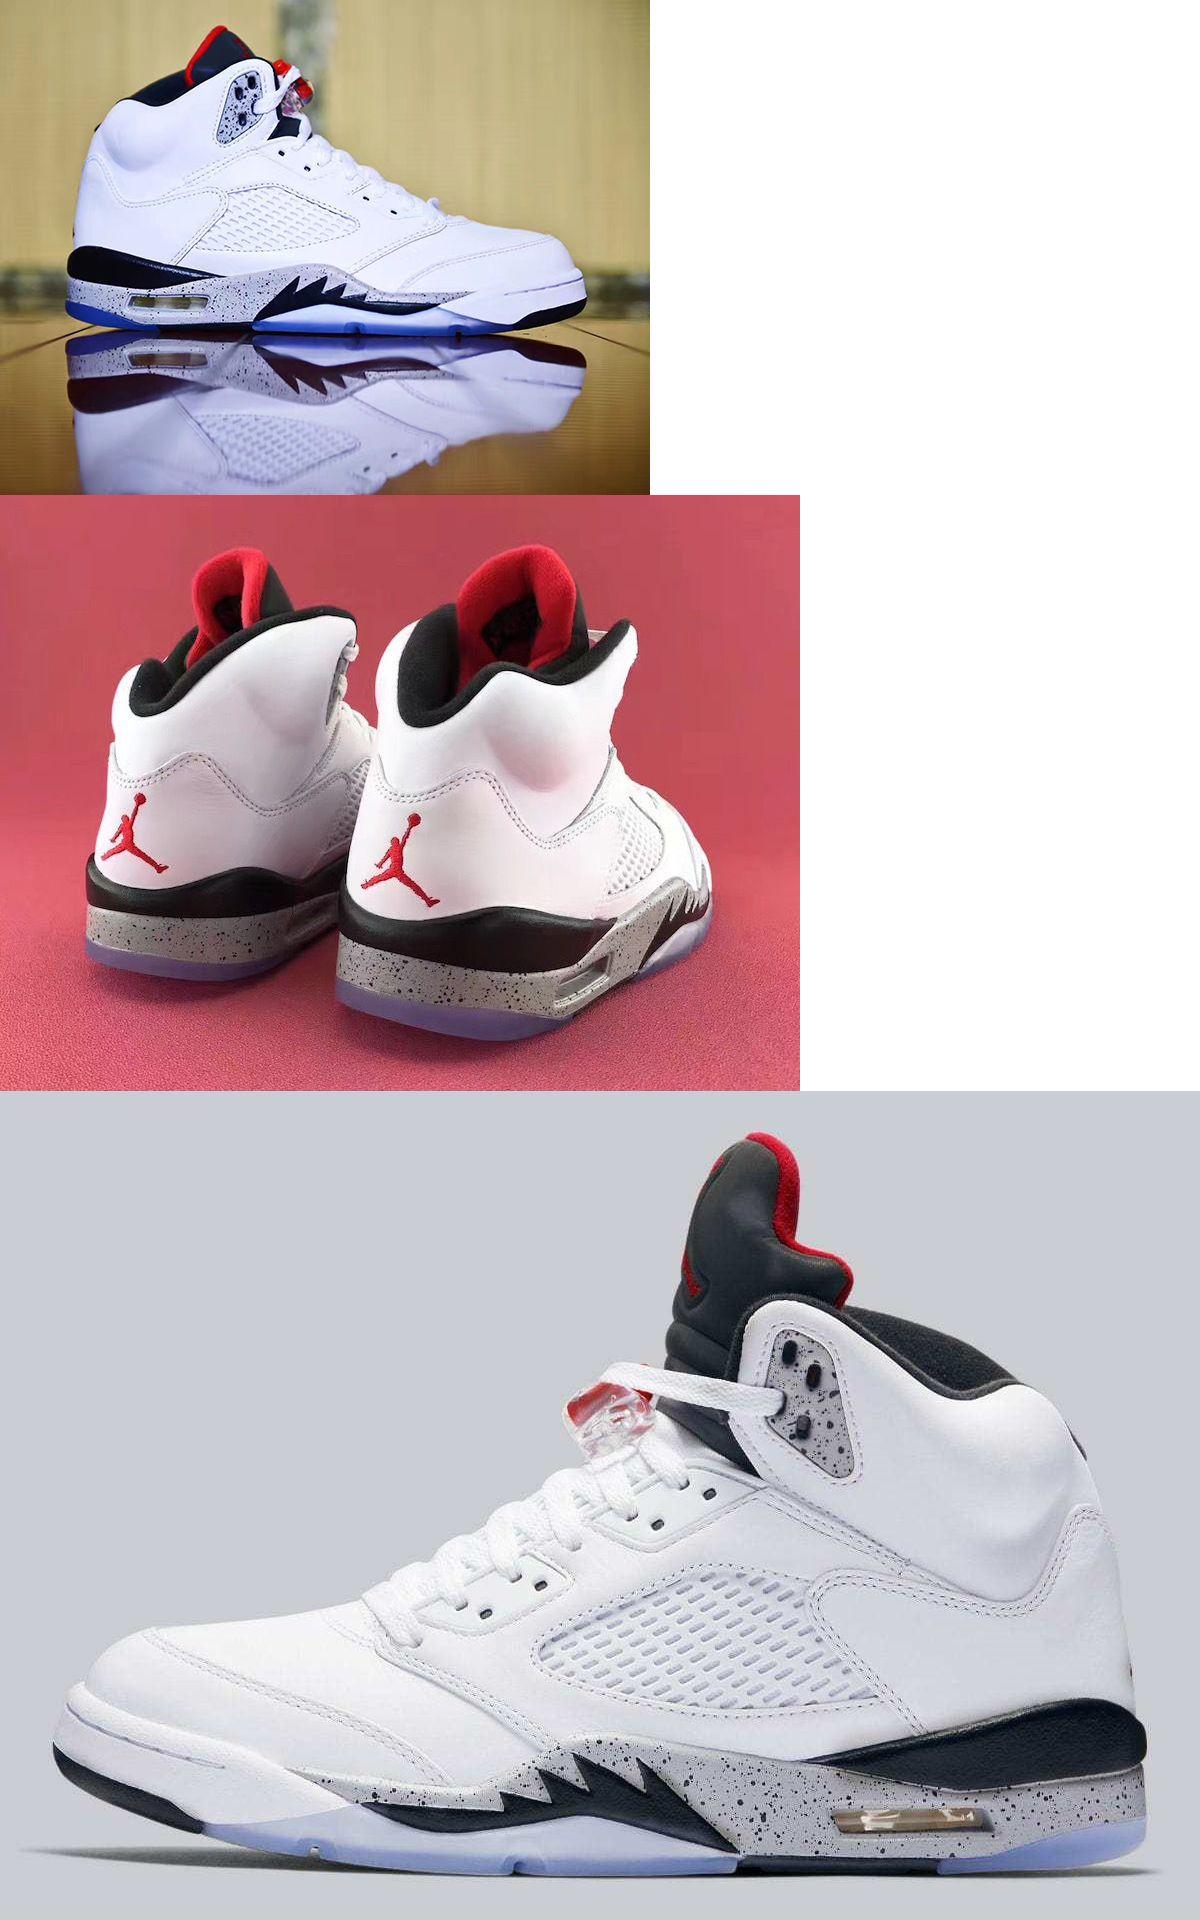 Boys Shoes 57929: Nike Air Jordan 5 Retro Sz 5.5Y White Cement Red Metallic